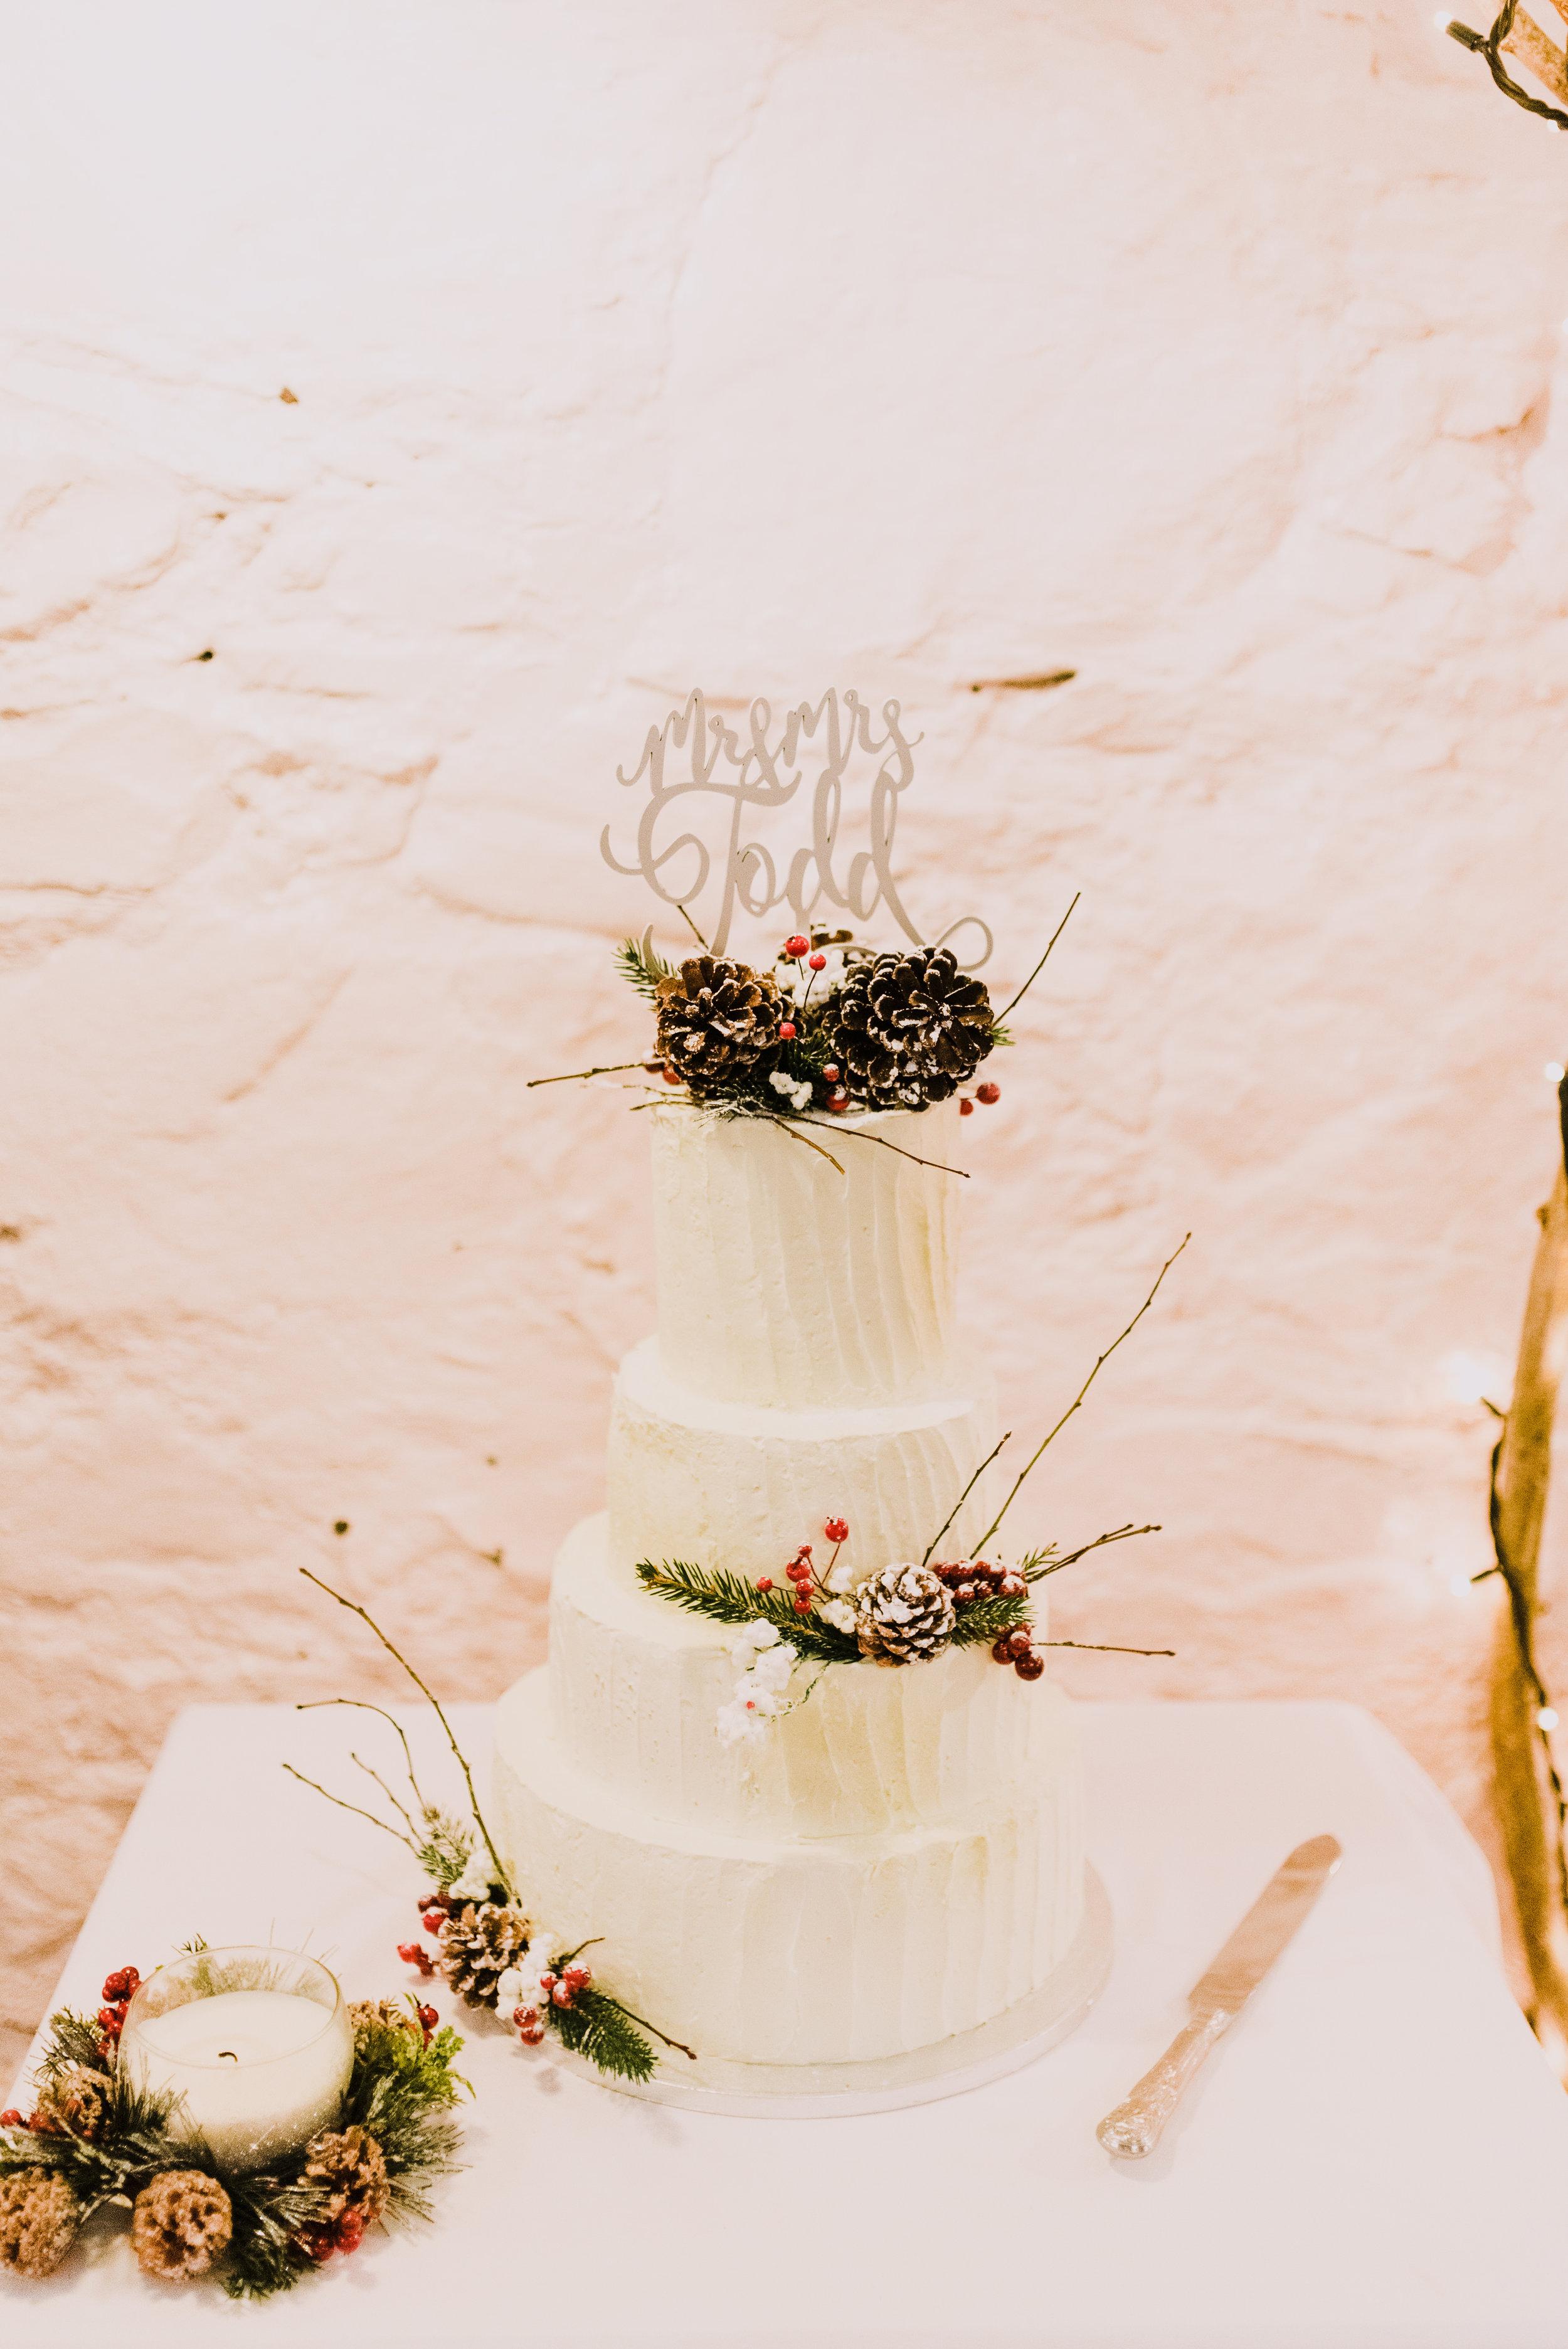 larchfield estate wedding, wedding venues northern ireland, barn wedding venues northern ireland, wedding photos larchfield estate, shane todd wedding, larchfield wedding decor ideas (2).jpg